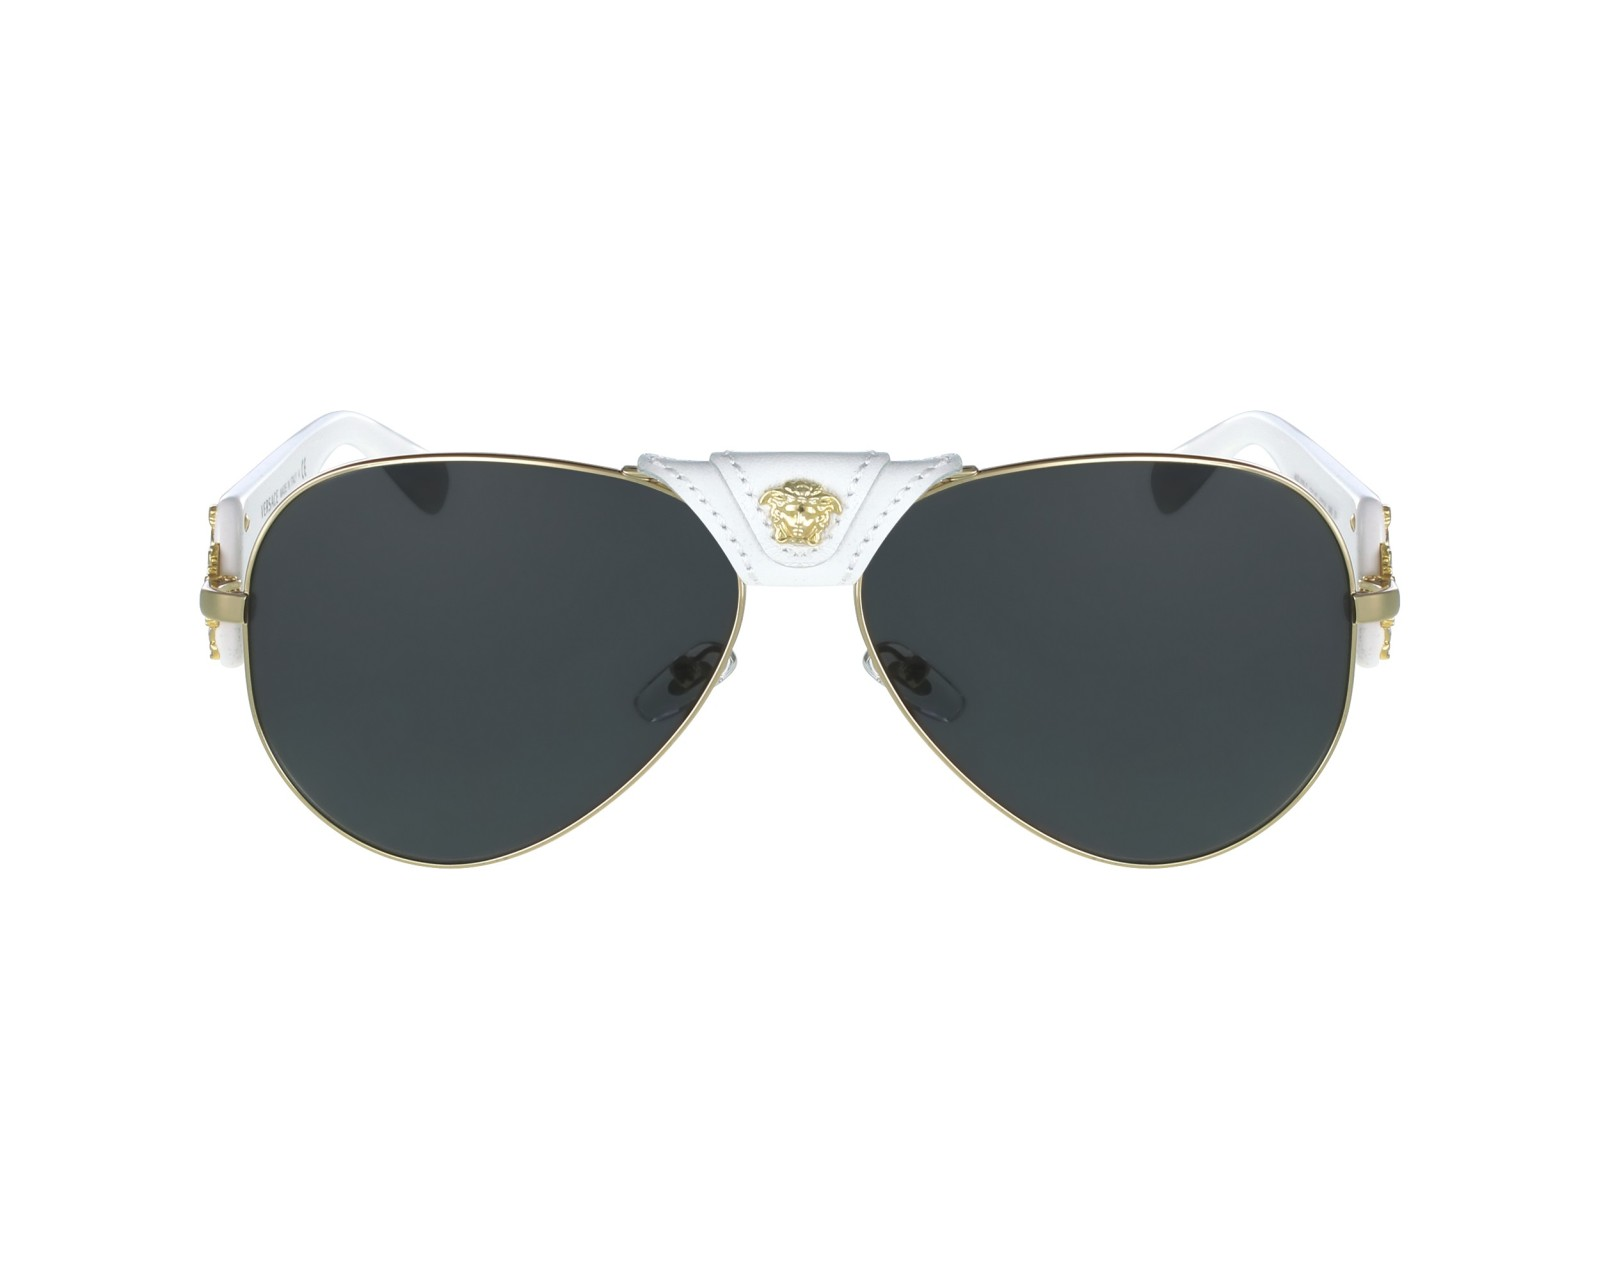 78f8111f06a Versace VE-2150-Q 1341/87